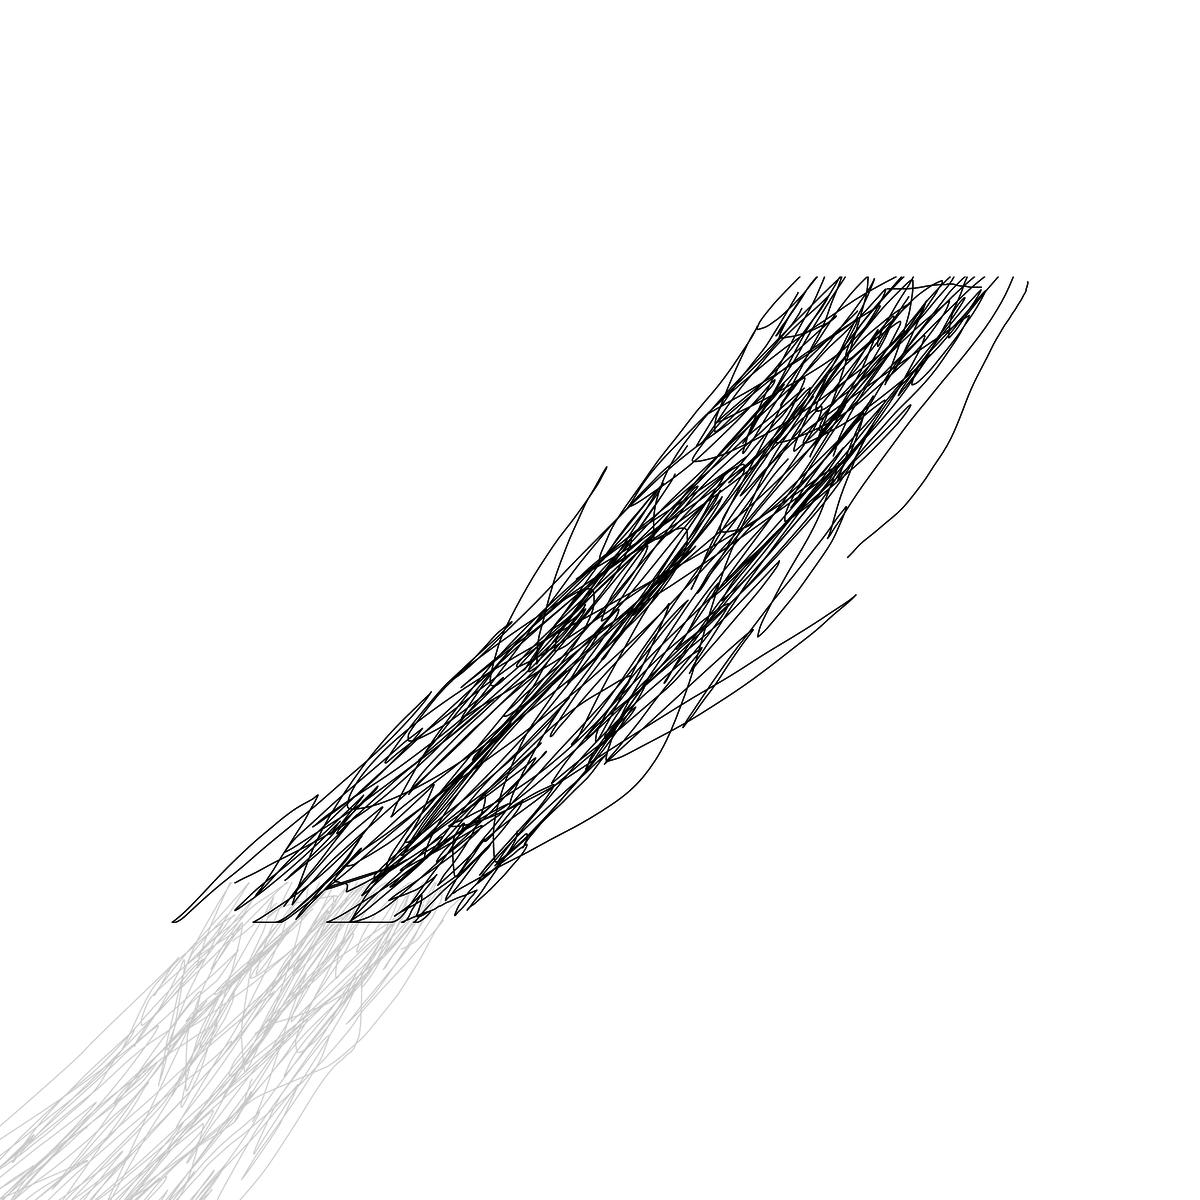 BAAAM drawing#6134 lat:51.3321456909179700lng: 12.3622541427612300